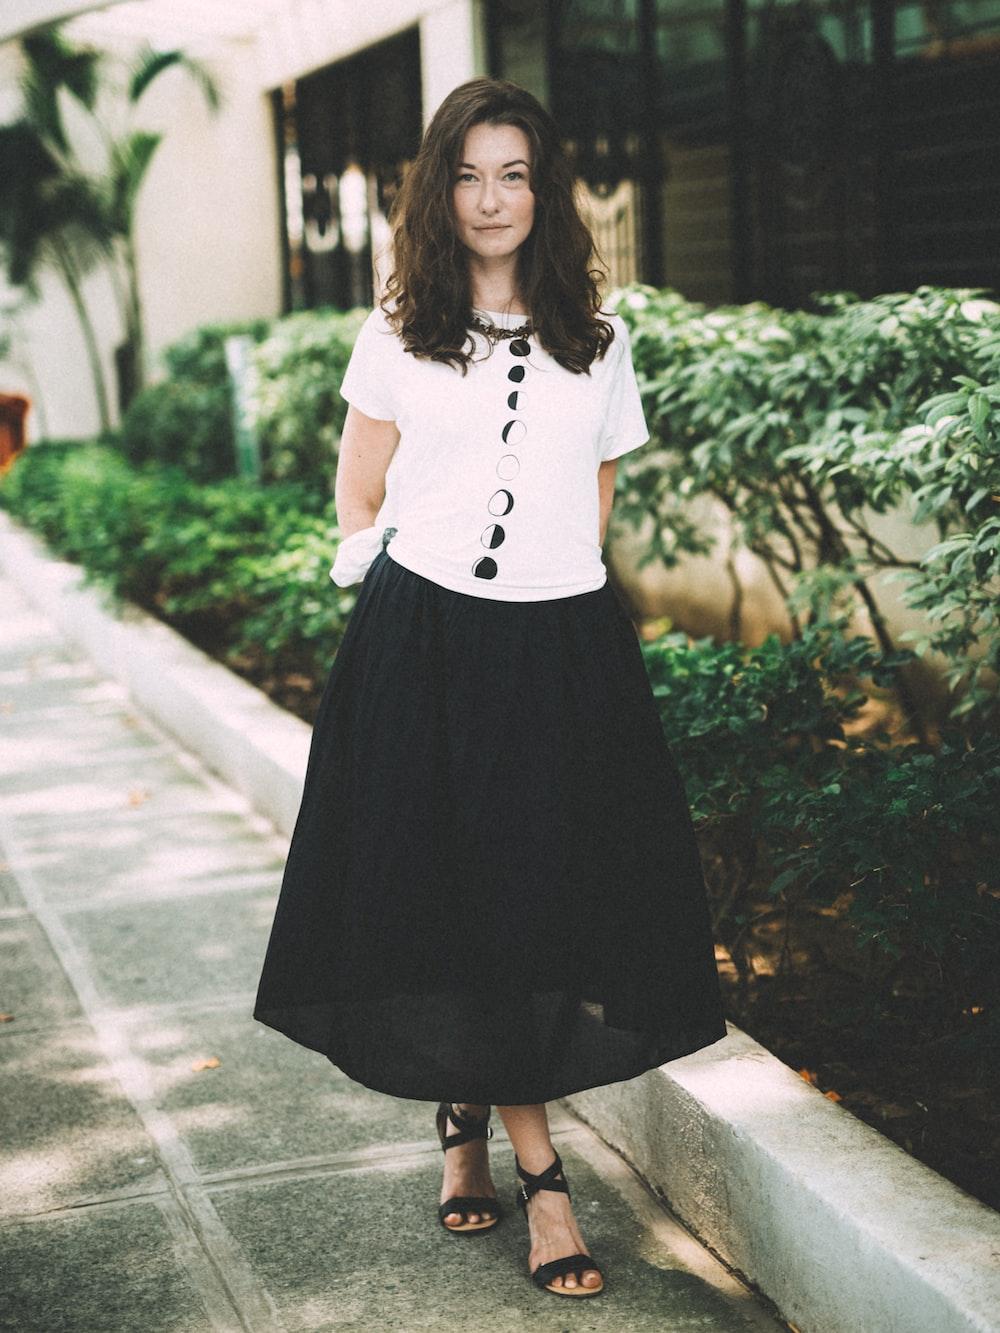 woman wearing black skirt standing beside plants